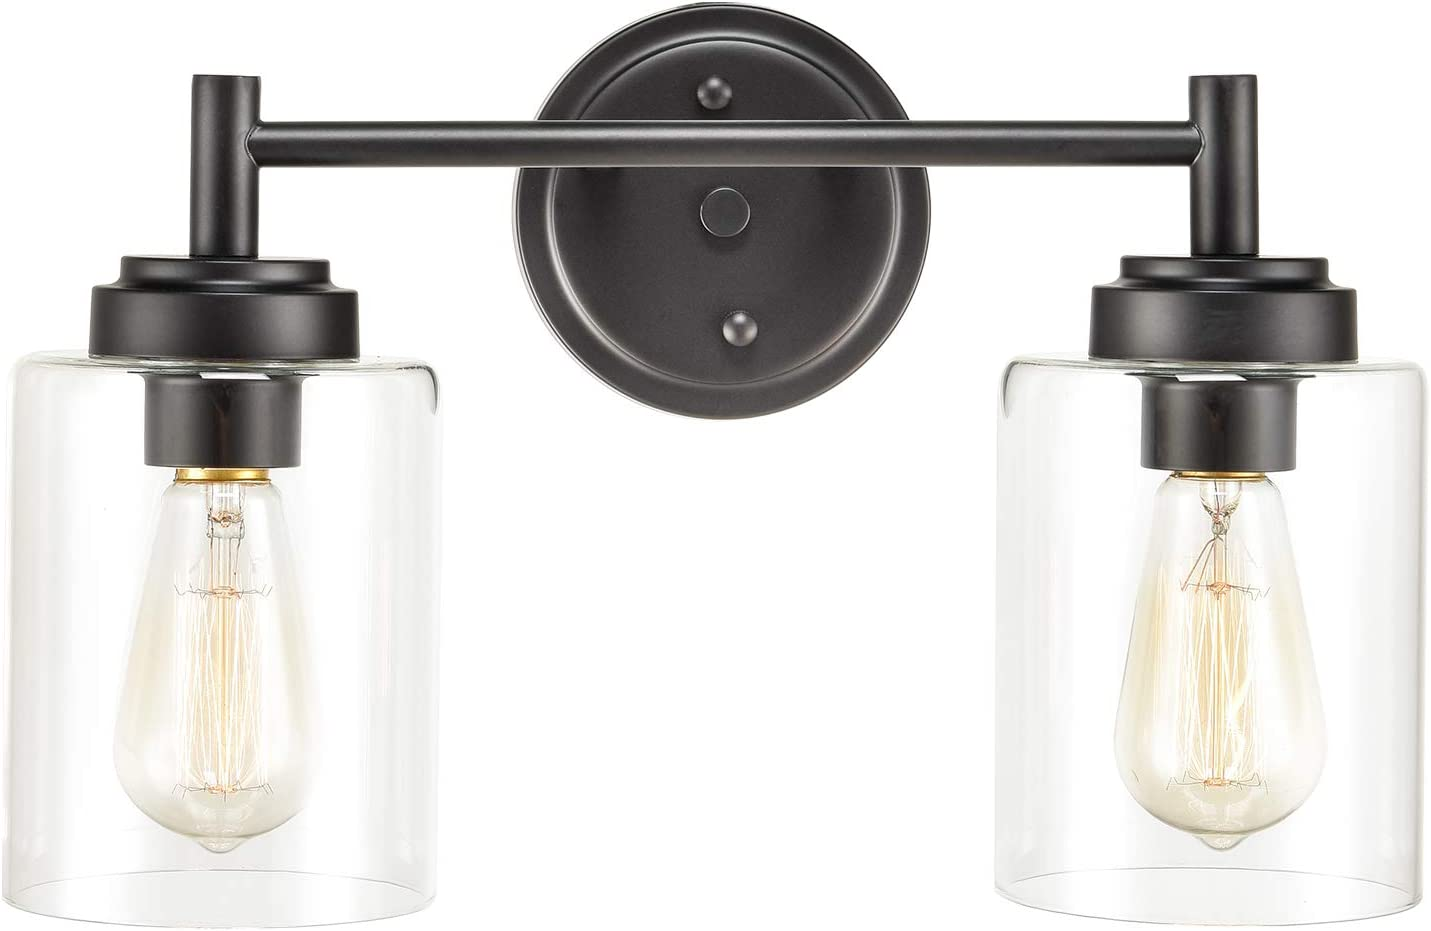 Farmhouse Wall Sconce 2-Light Black Light Bath Vanity wi 2021new shipping Luxury free Fixture